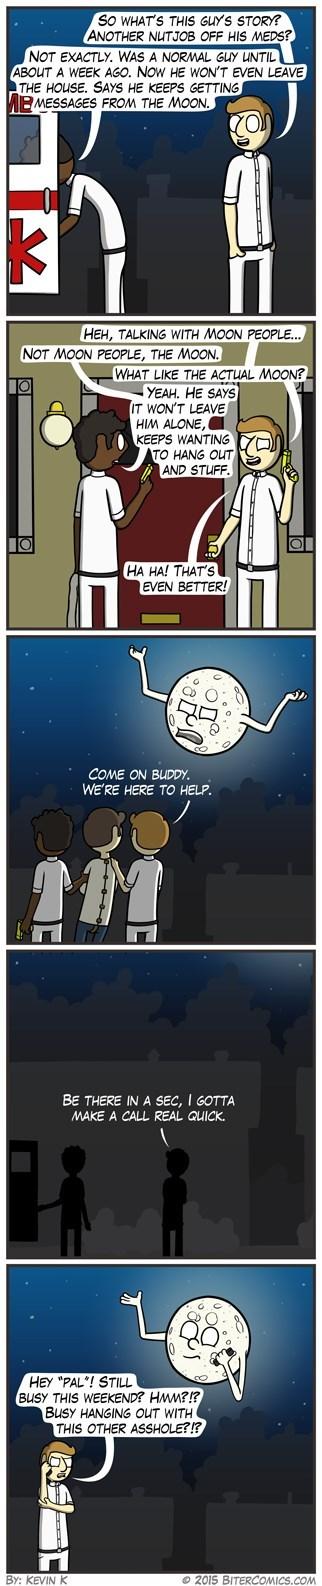 freaks,moon,idgi,web comics